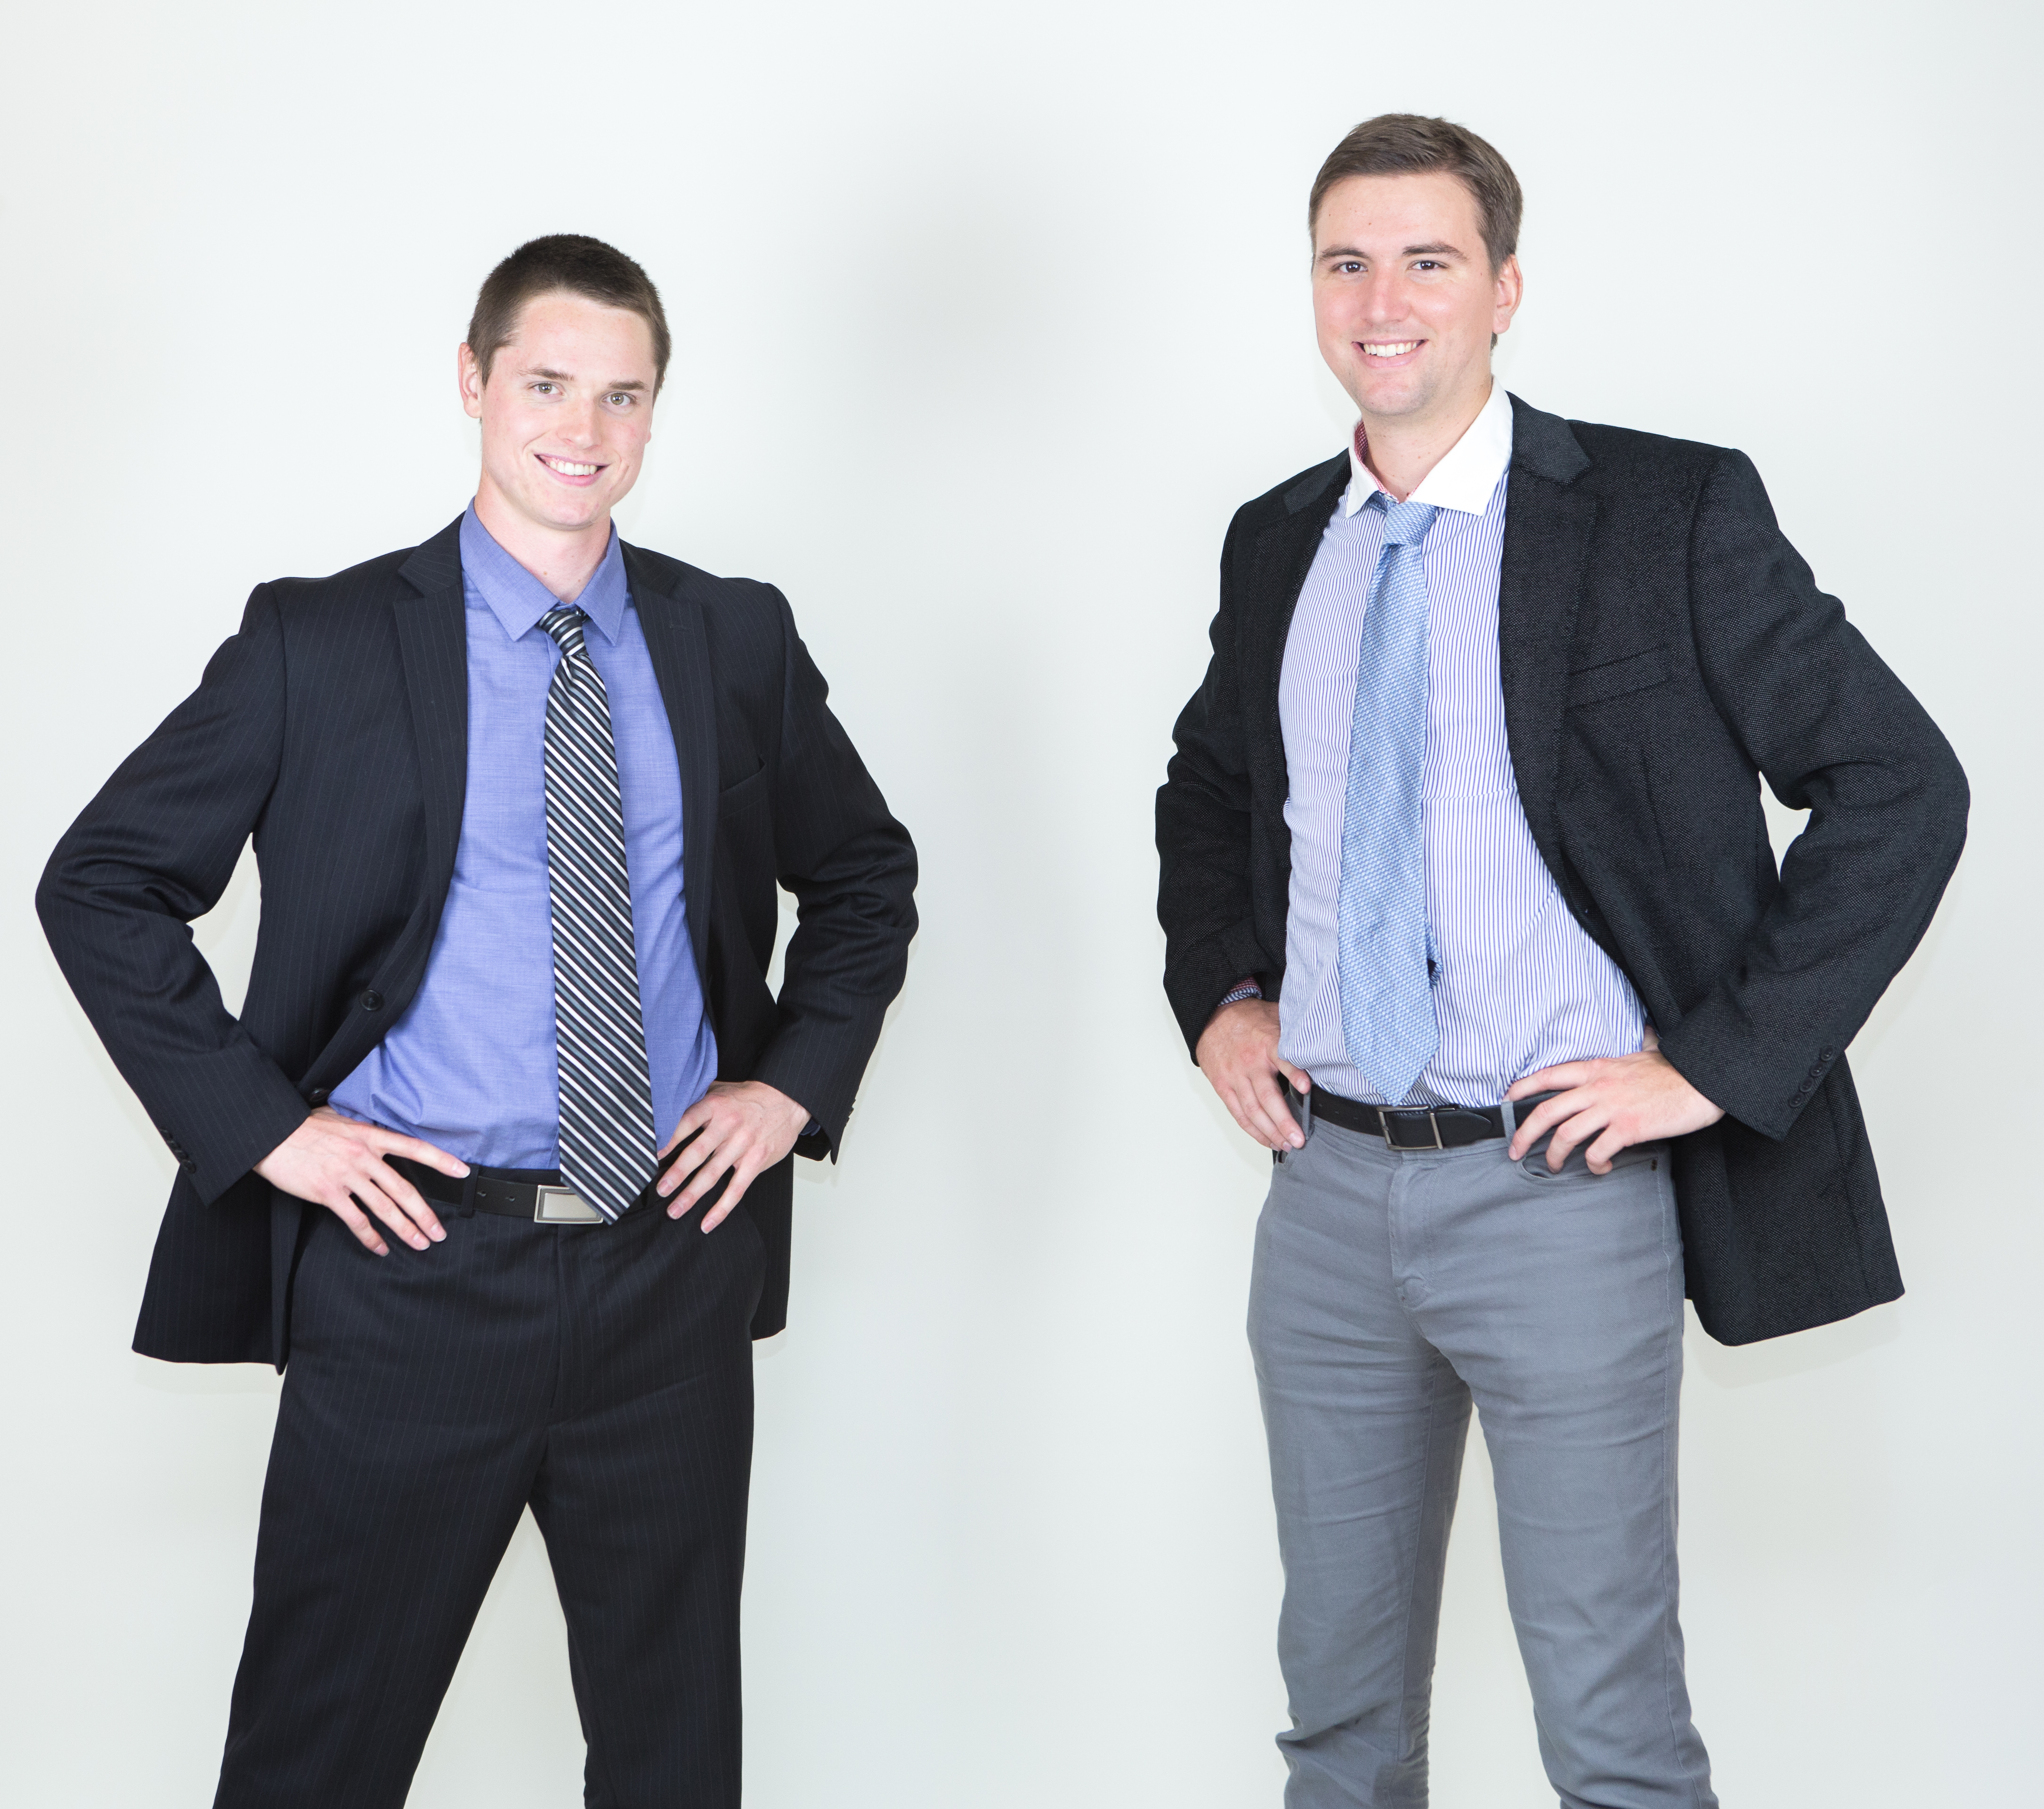 Crawford and O'Brien